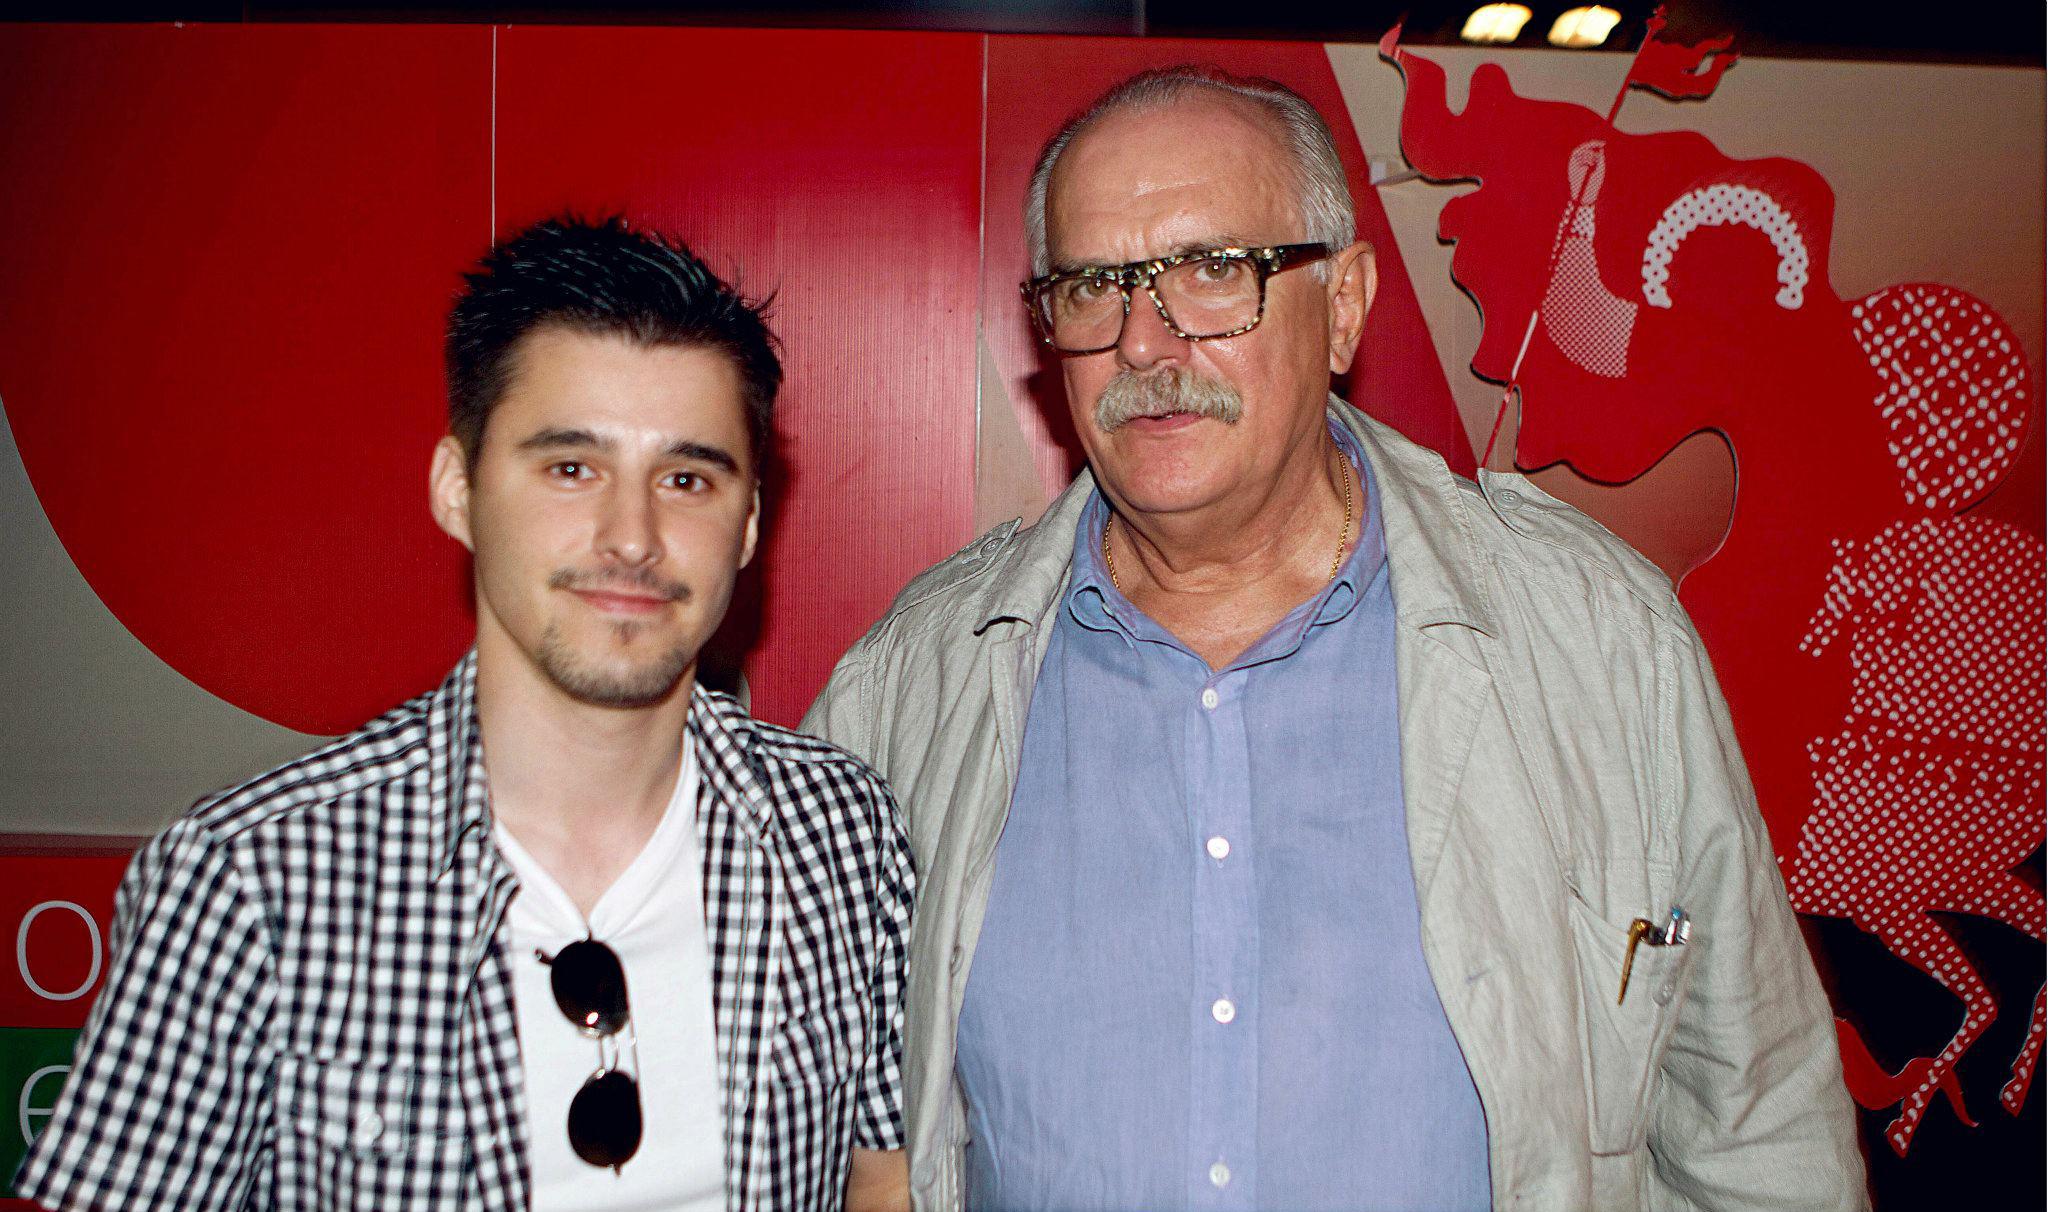 Nikita Mikhalkov: biography, personal life, creativity. Film director, actor, screenwriter and producer Nikita Mikhalkov 88